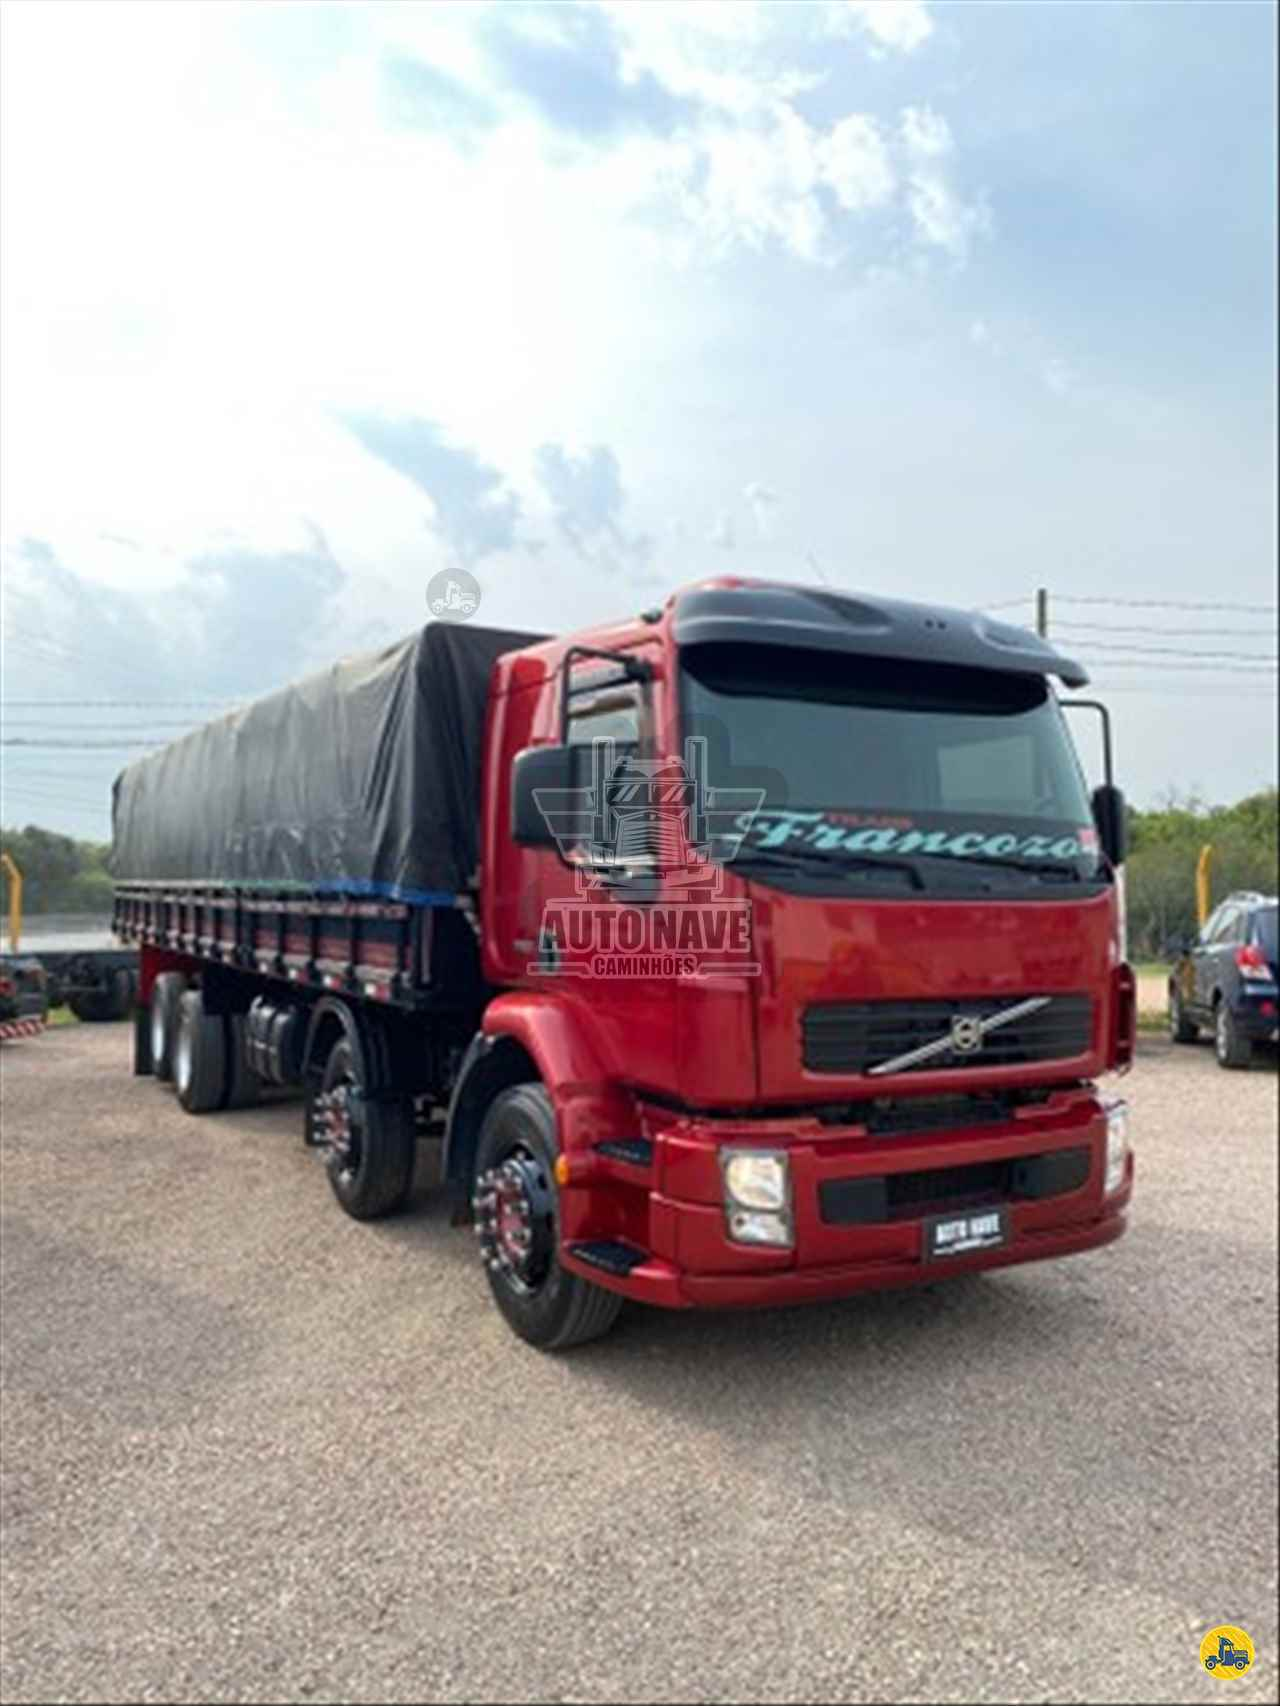 CAMINHAO VOLVO VOLVO VM 260 Graneleiro BiTruck 8x2 Auto Nave Caminhões FAZENDA RIO GRANDE PARANÁ PR